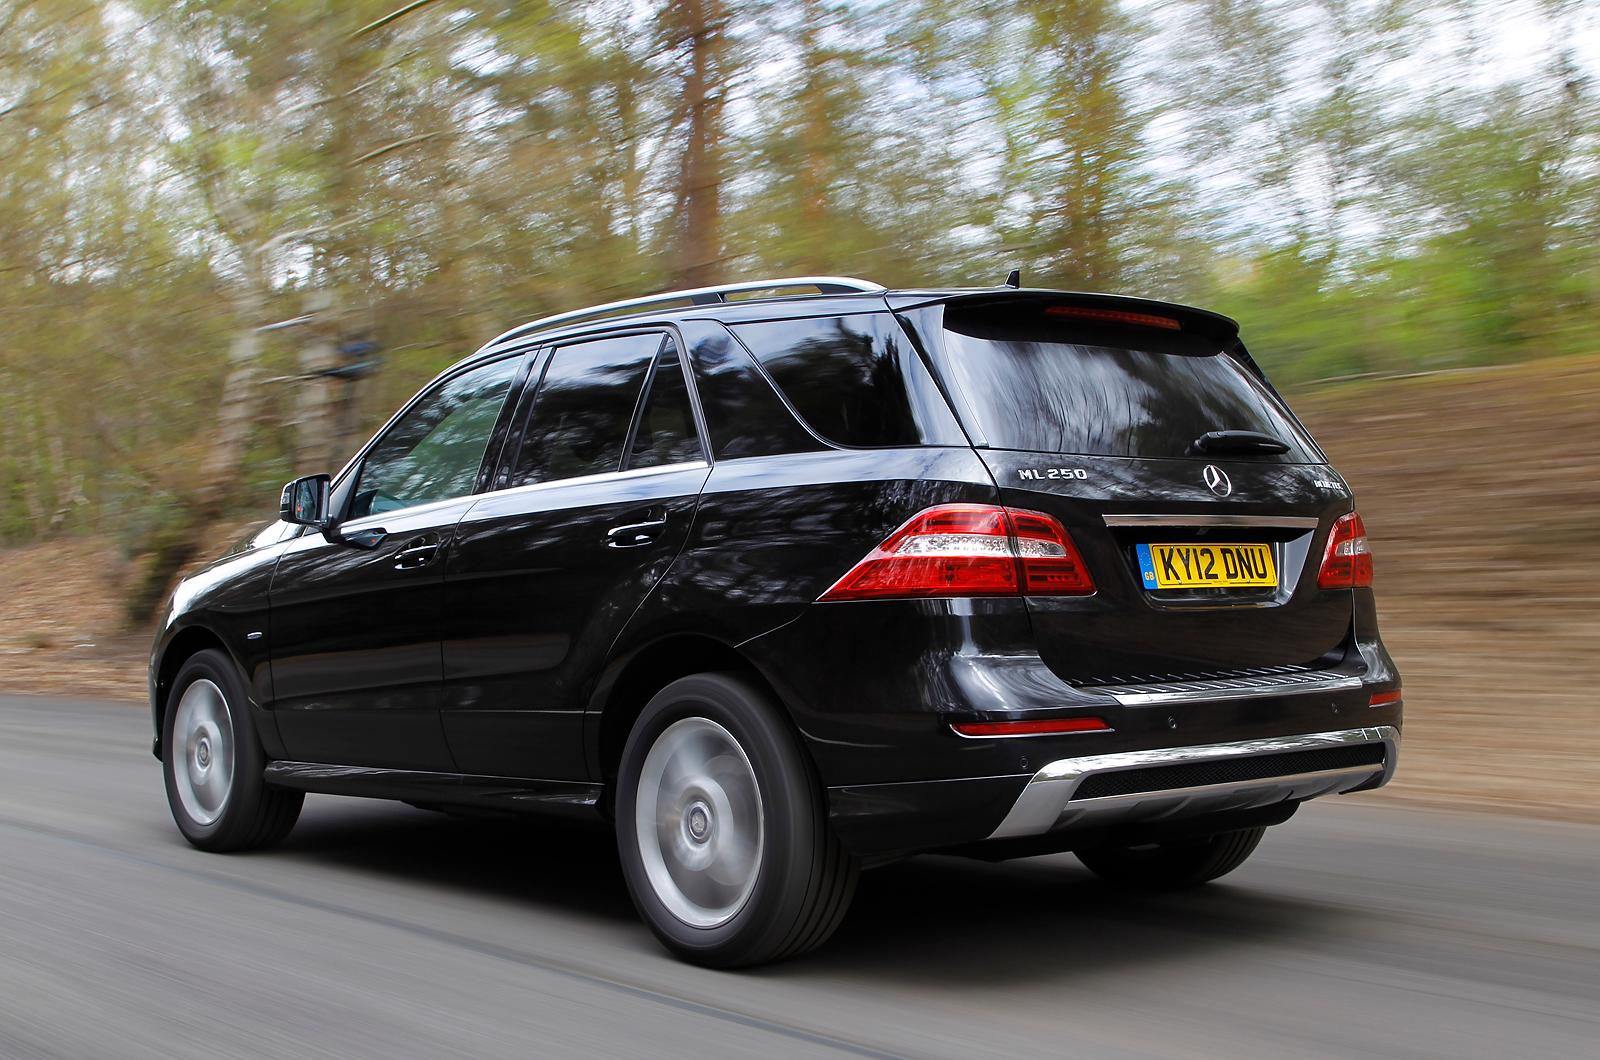 Mercedes benz m class picture 12 reviews news specs for M class mercedes benz